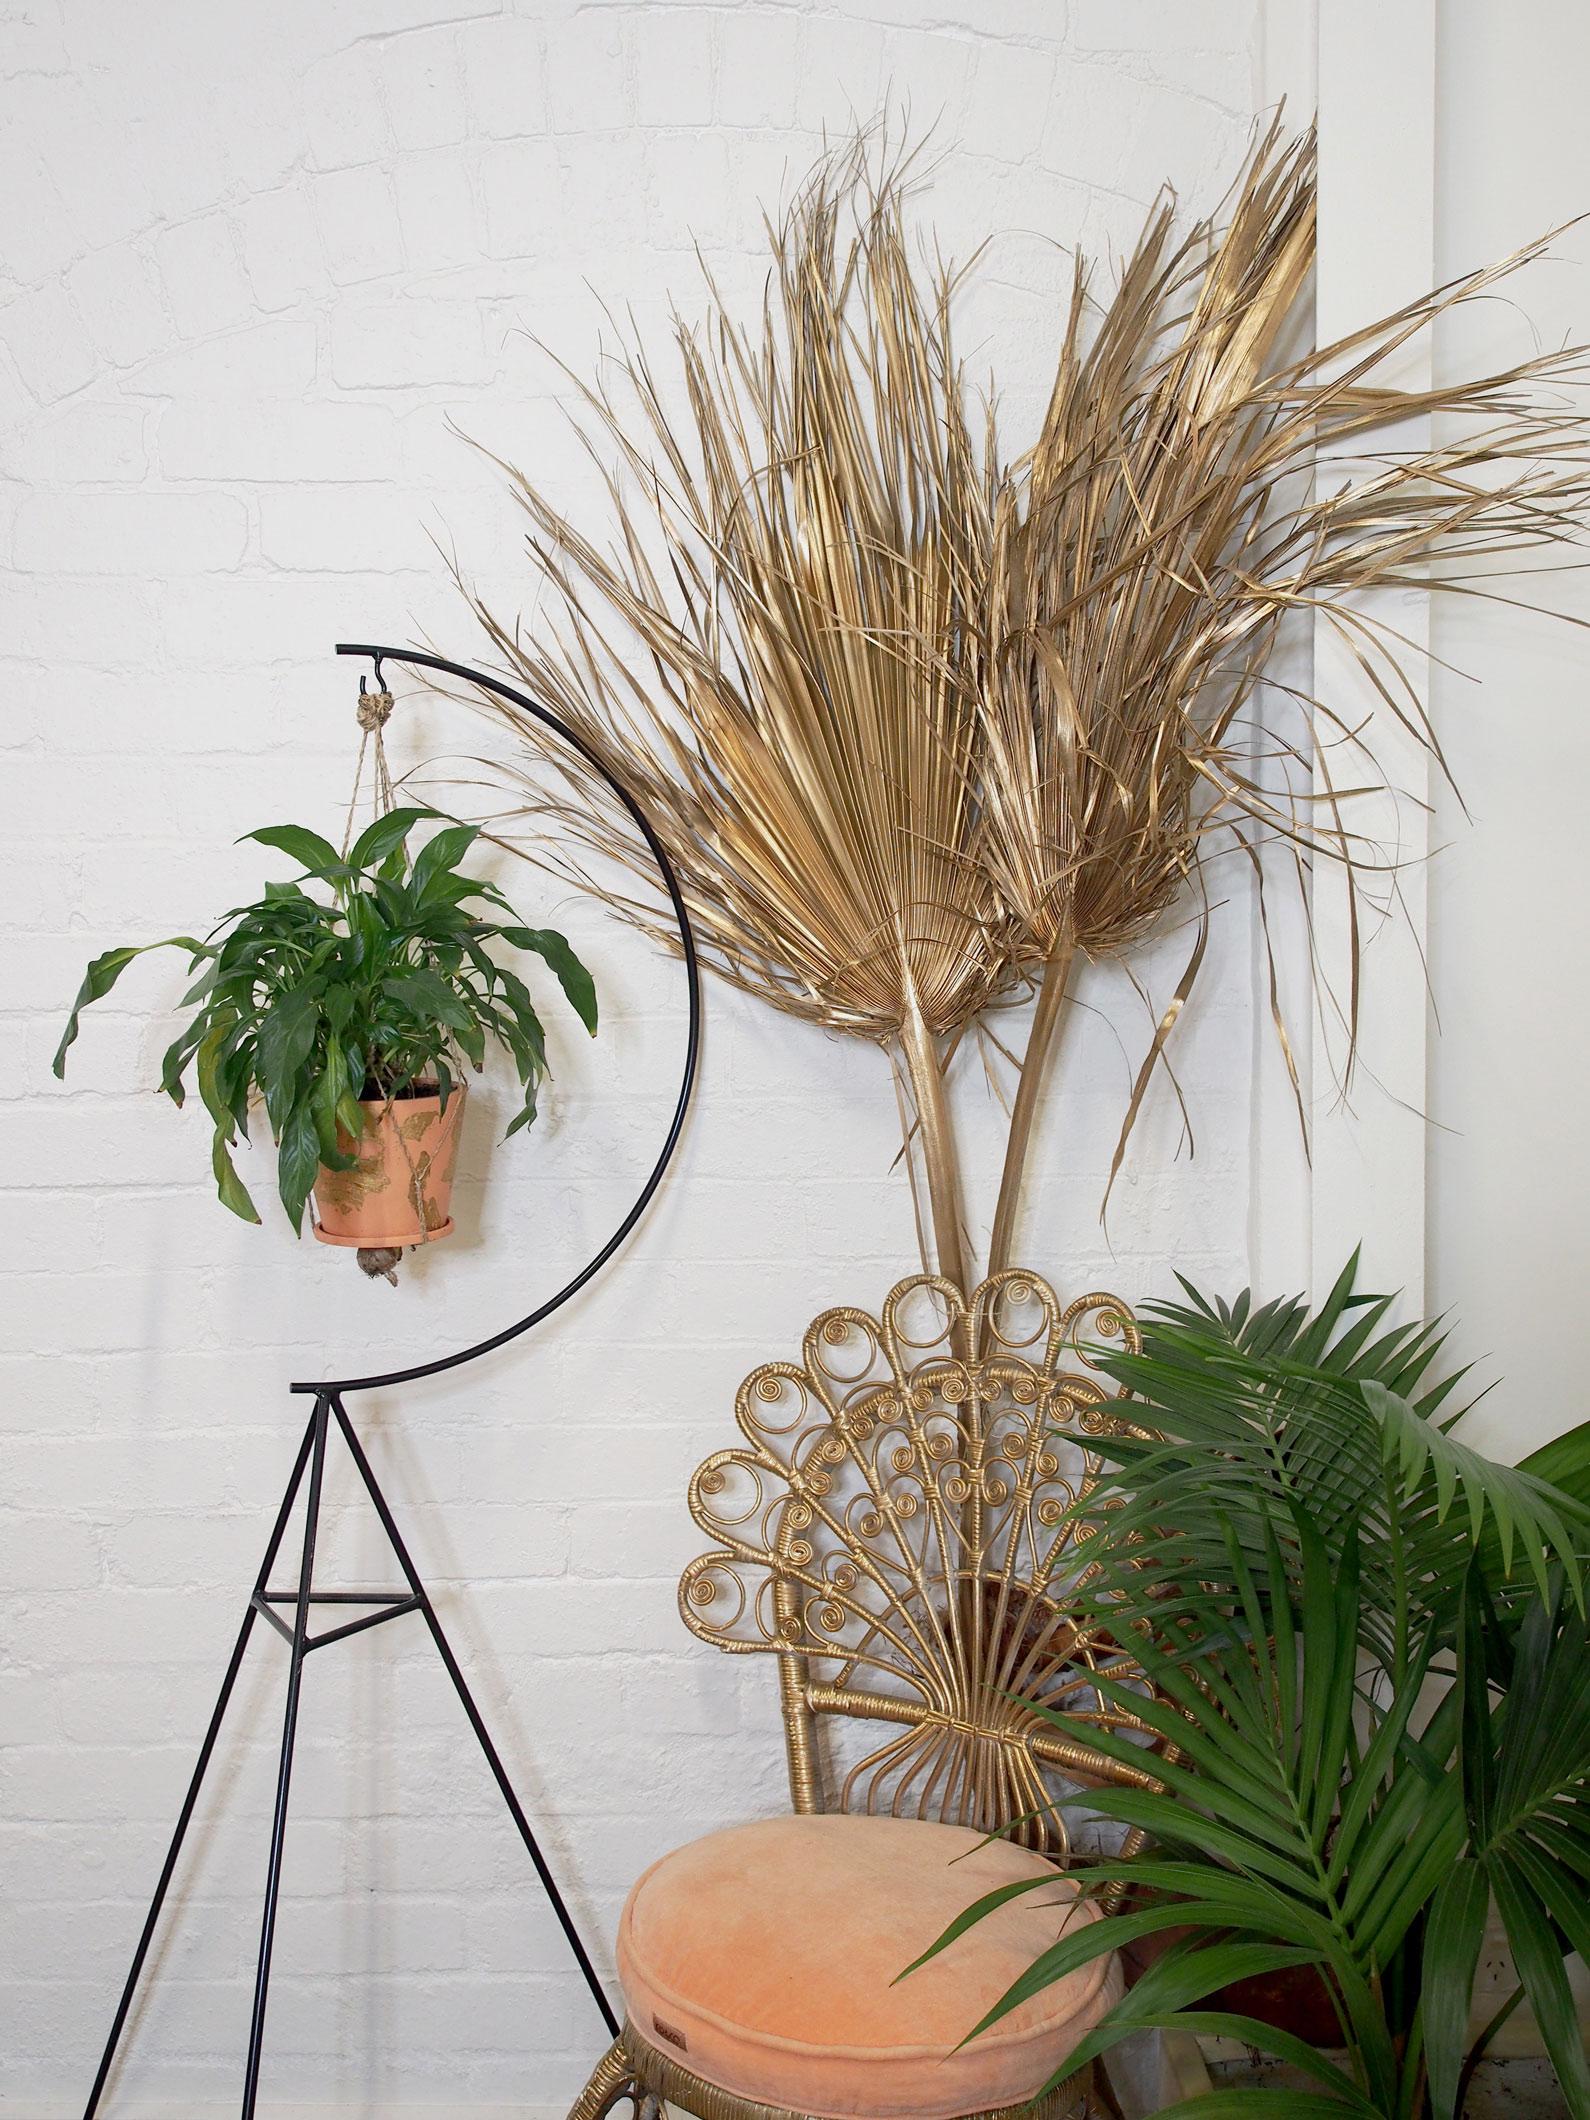 Studio-Mimi-Moon-New-Palm-Court-Orchestra-Styling-art-direction-Photoshoot-5